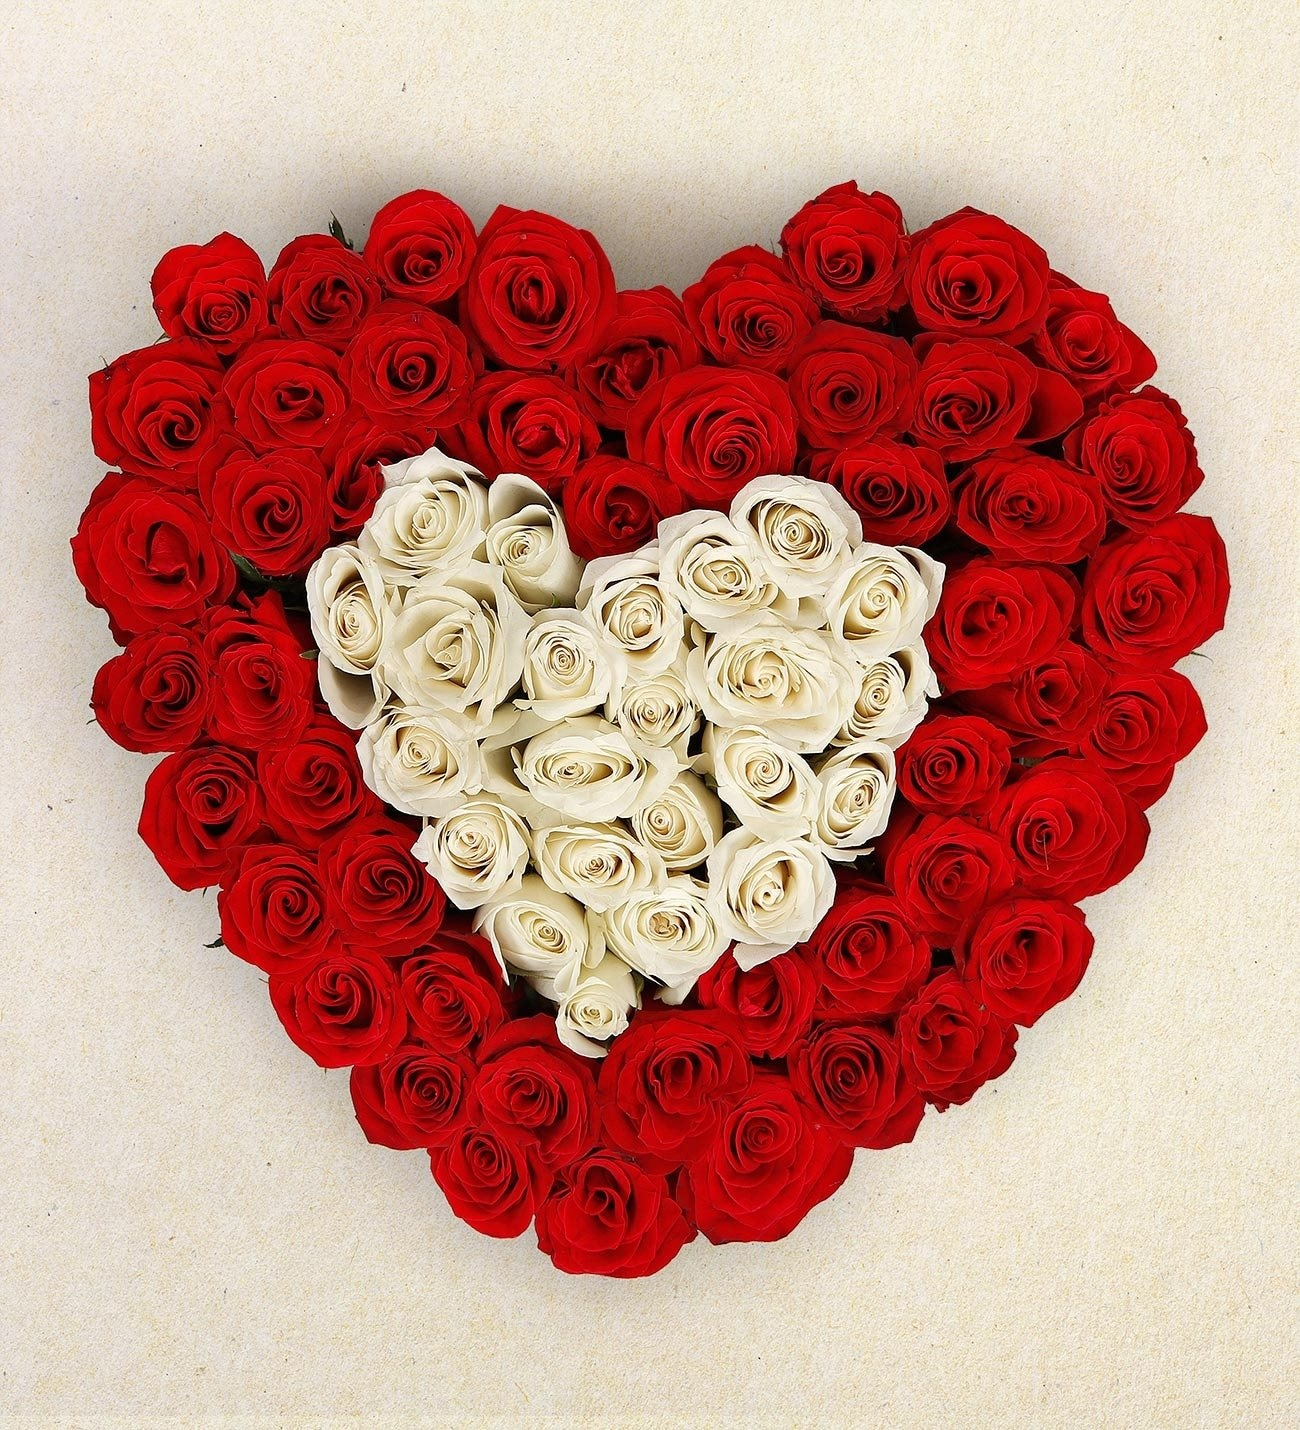 Eternal Love Heart Shaped Funeral Flowers